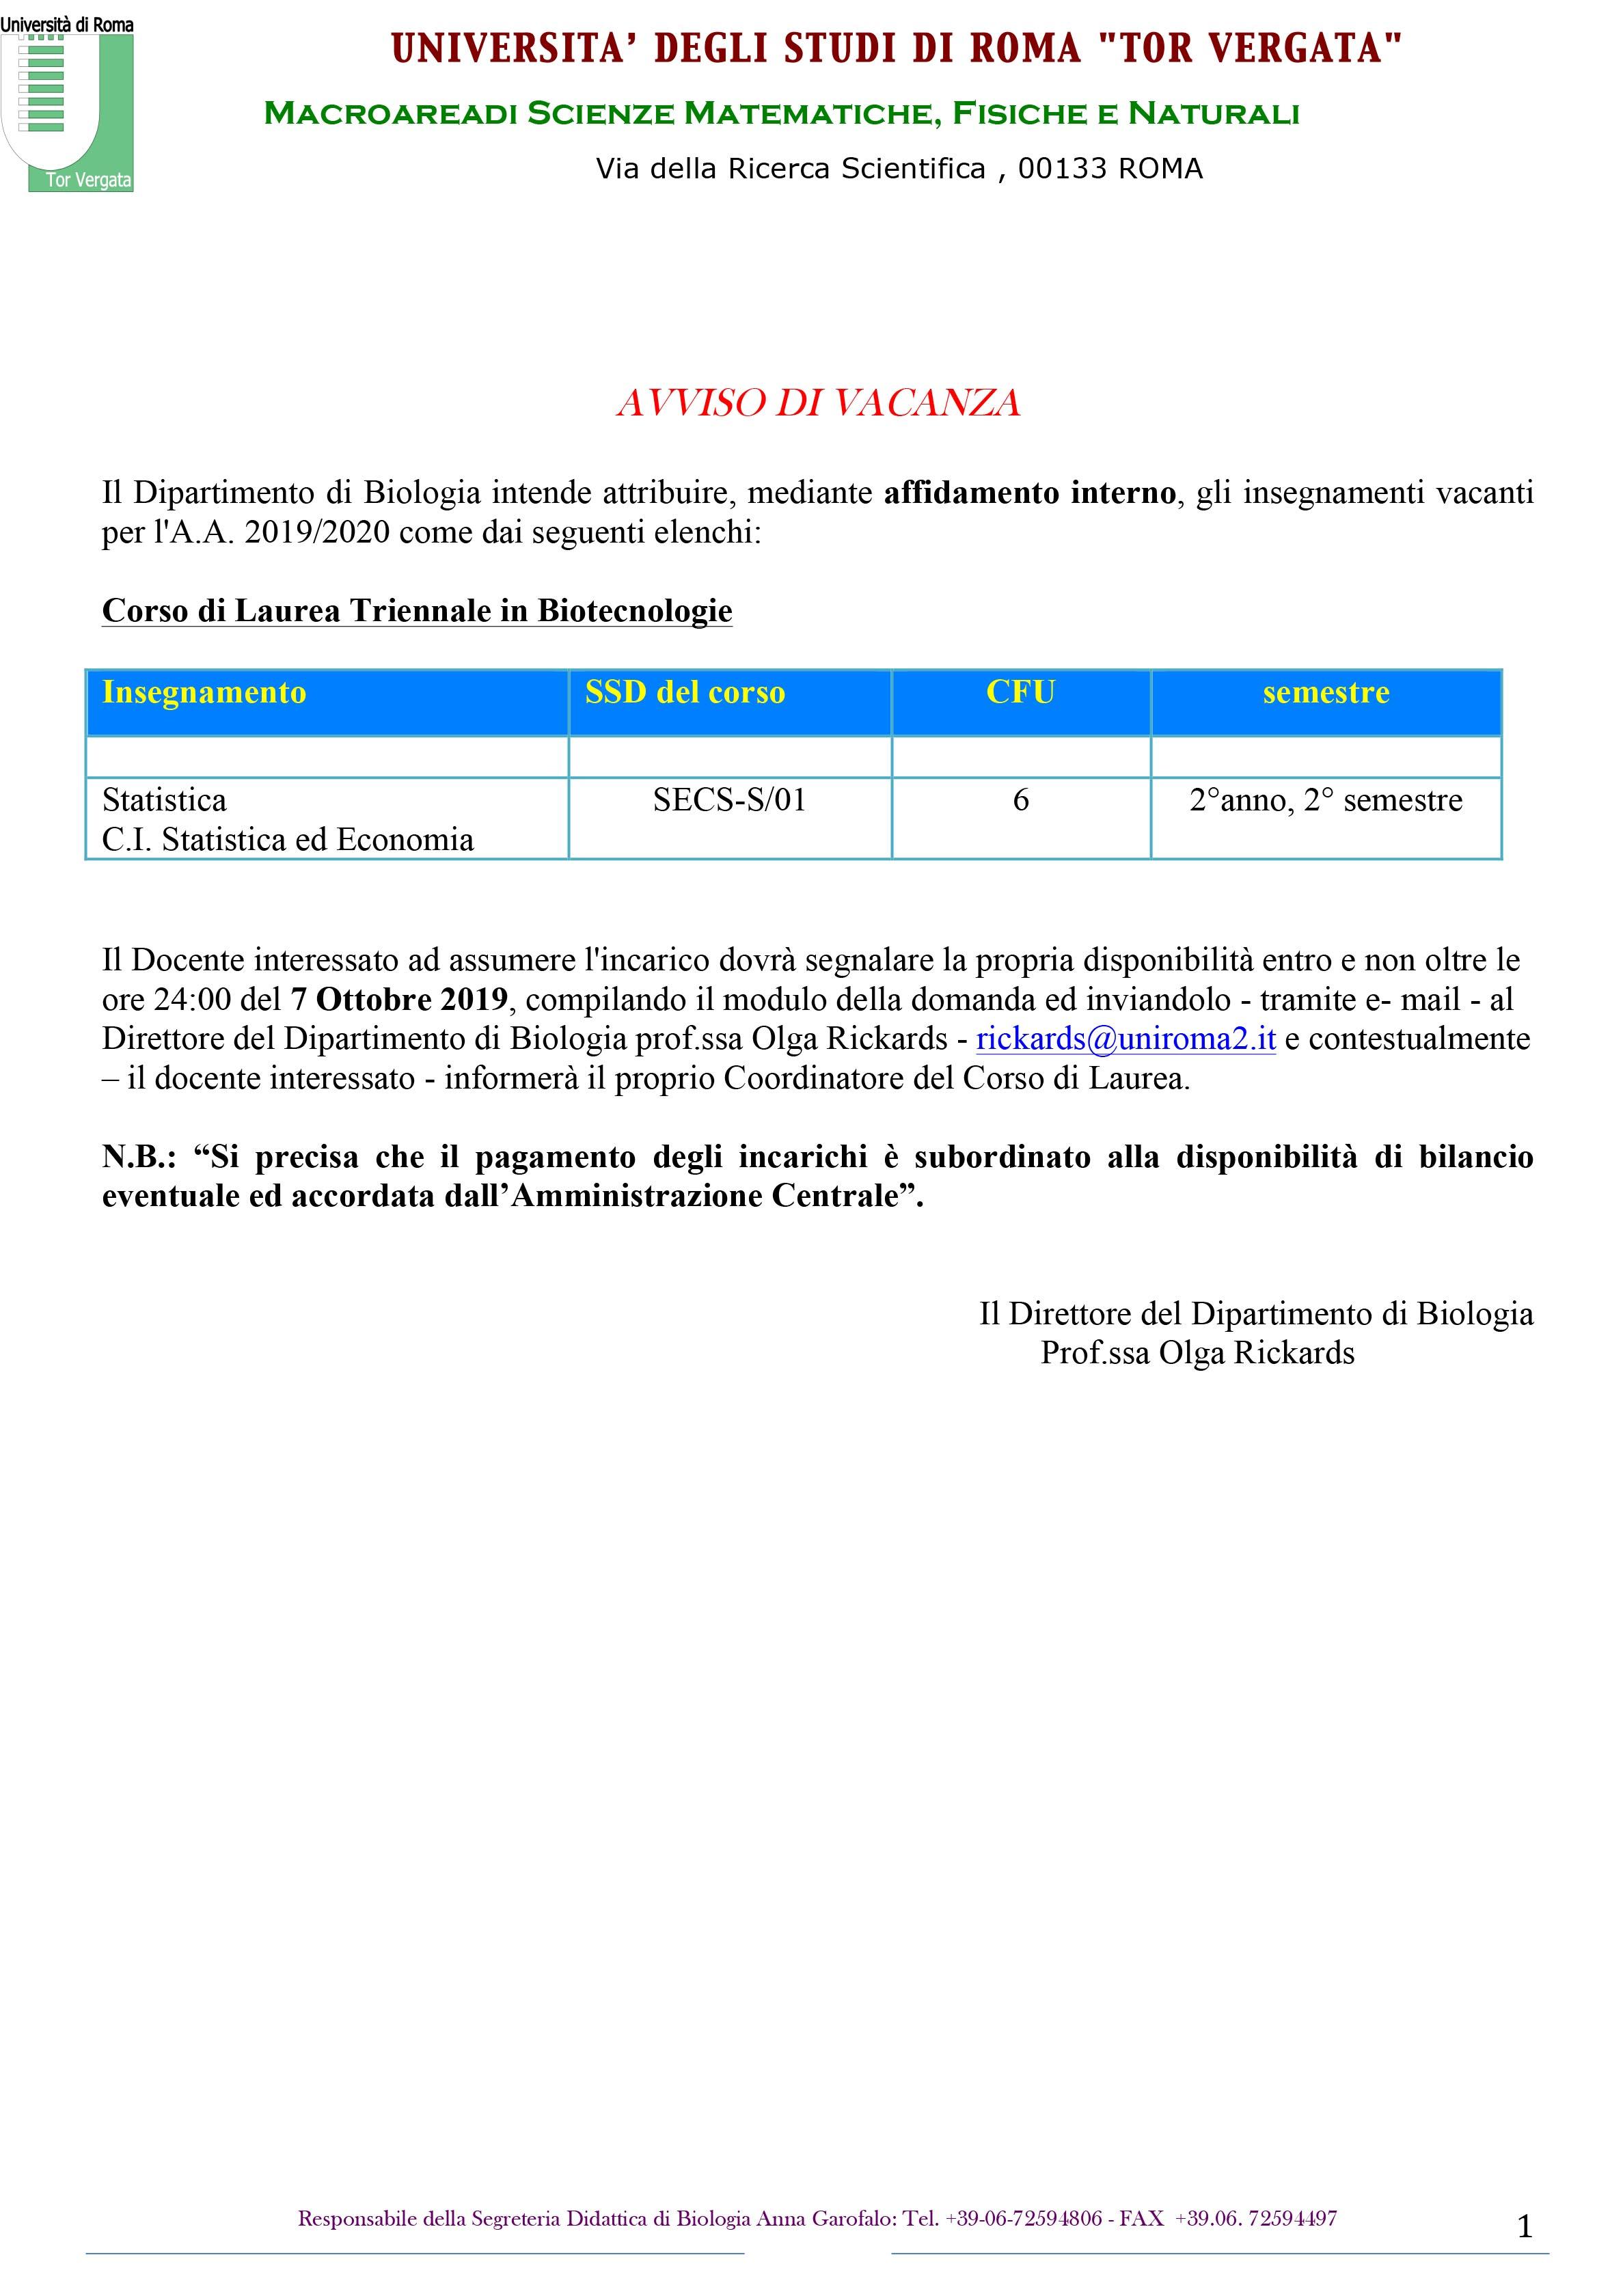 Microsoft Word - avviso vacanza biotecnologie.docx